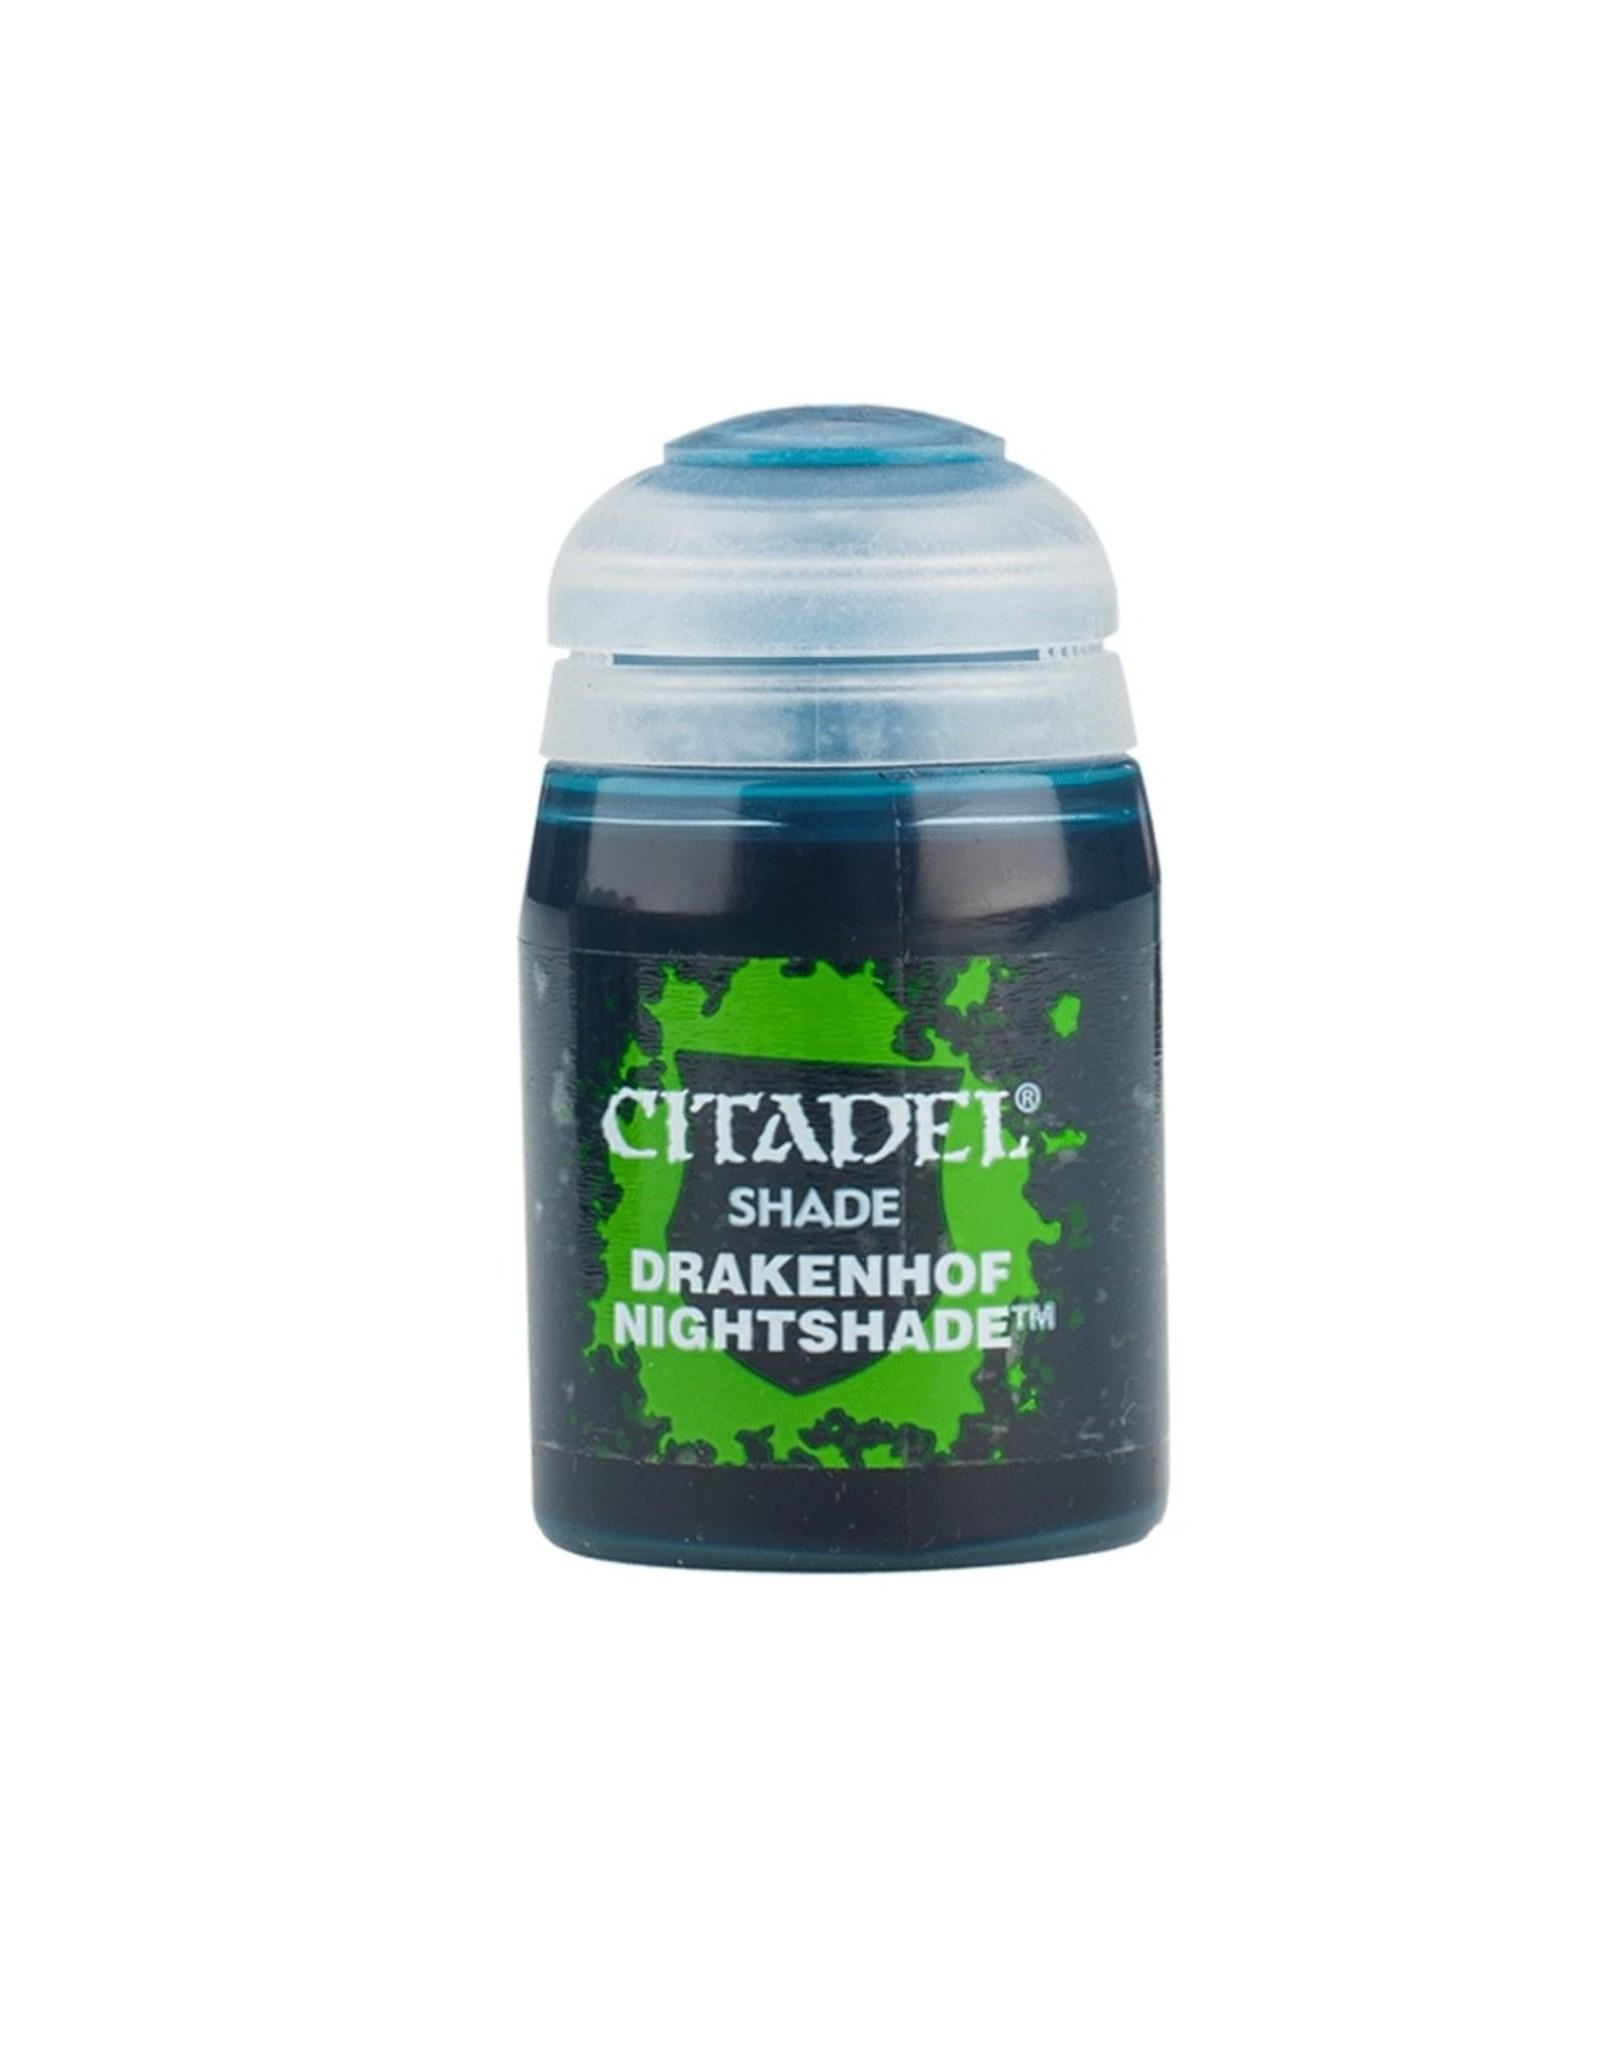 Games Workshop Citadel Shade Drakenhof Nightshade (24ML)